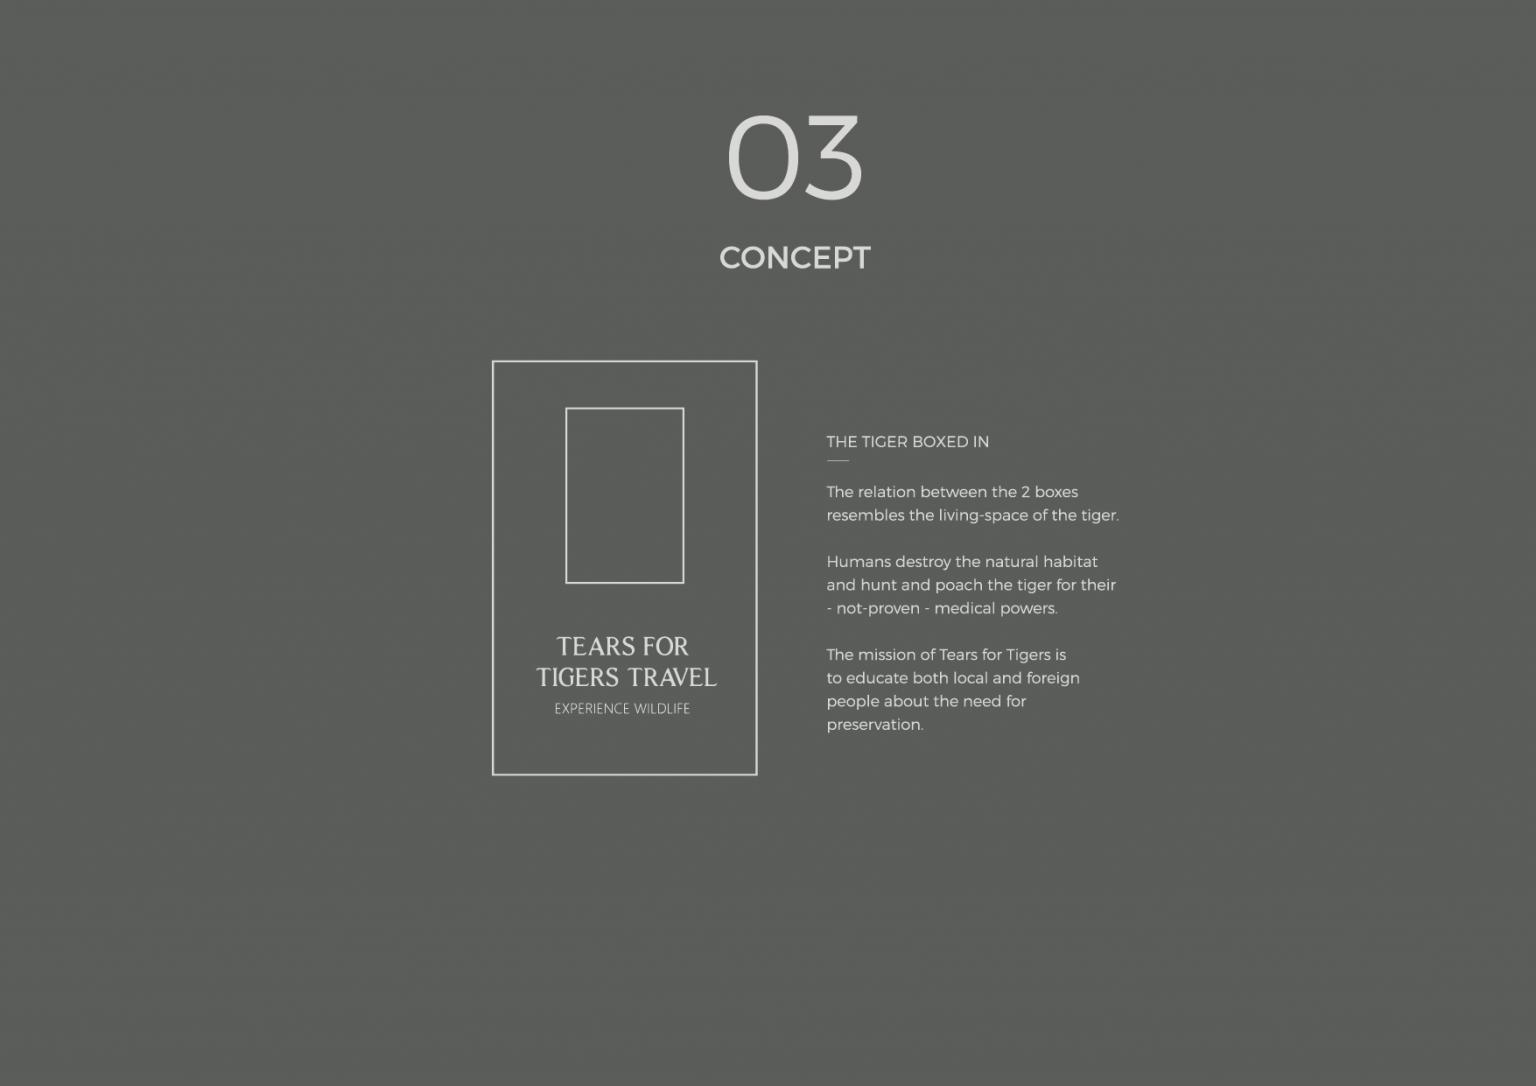 p03_BRANDBOOK-ILLUSTRATOR_FINAL_FLATTENED_03-Concept-1536x1086